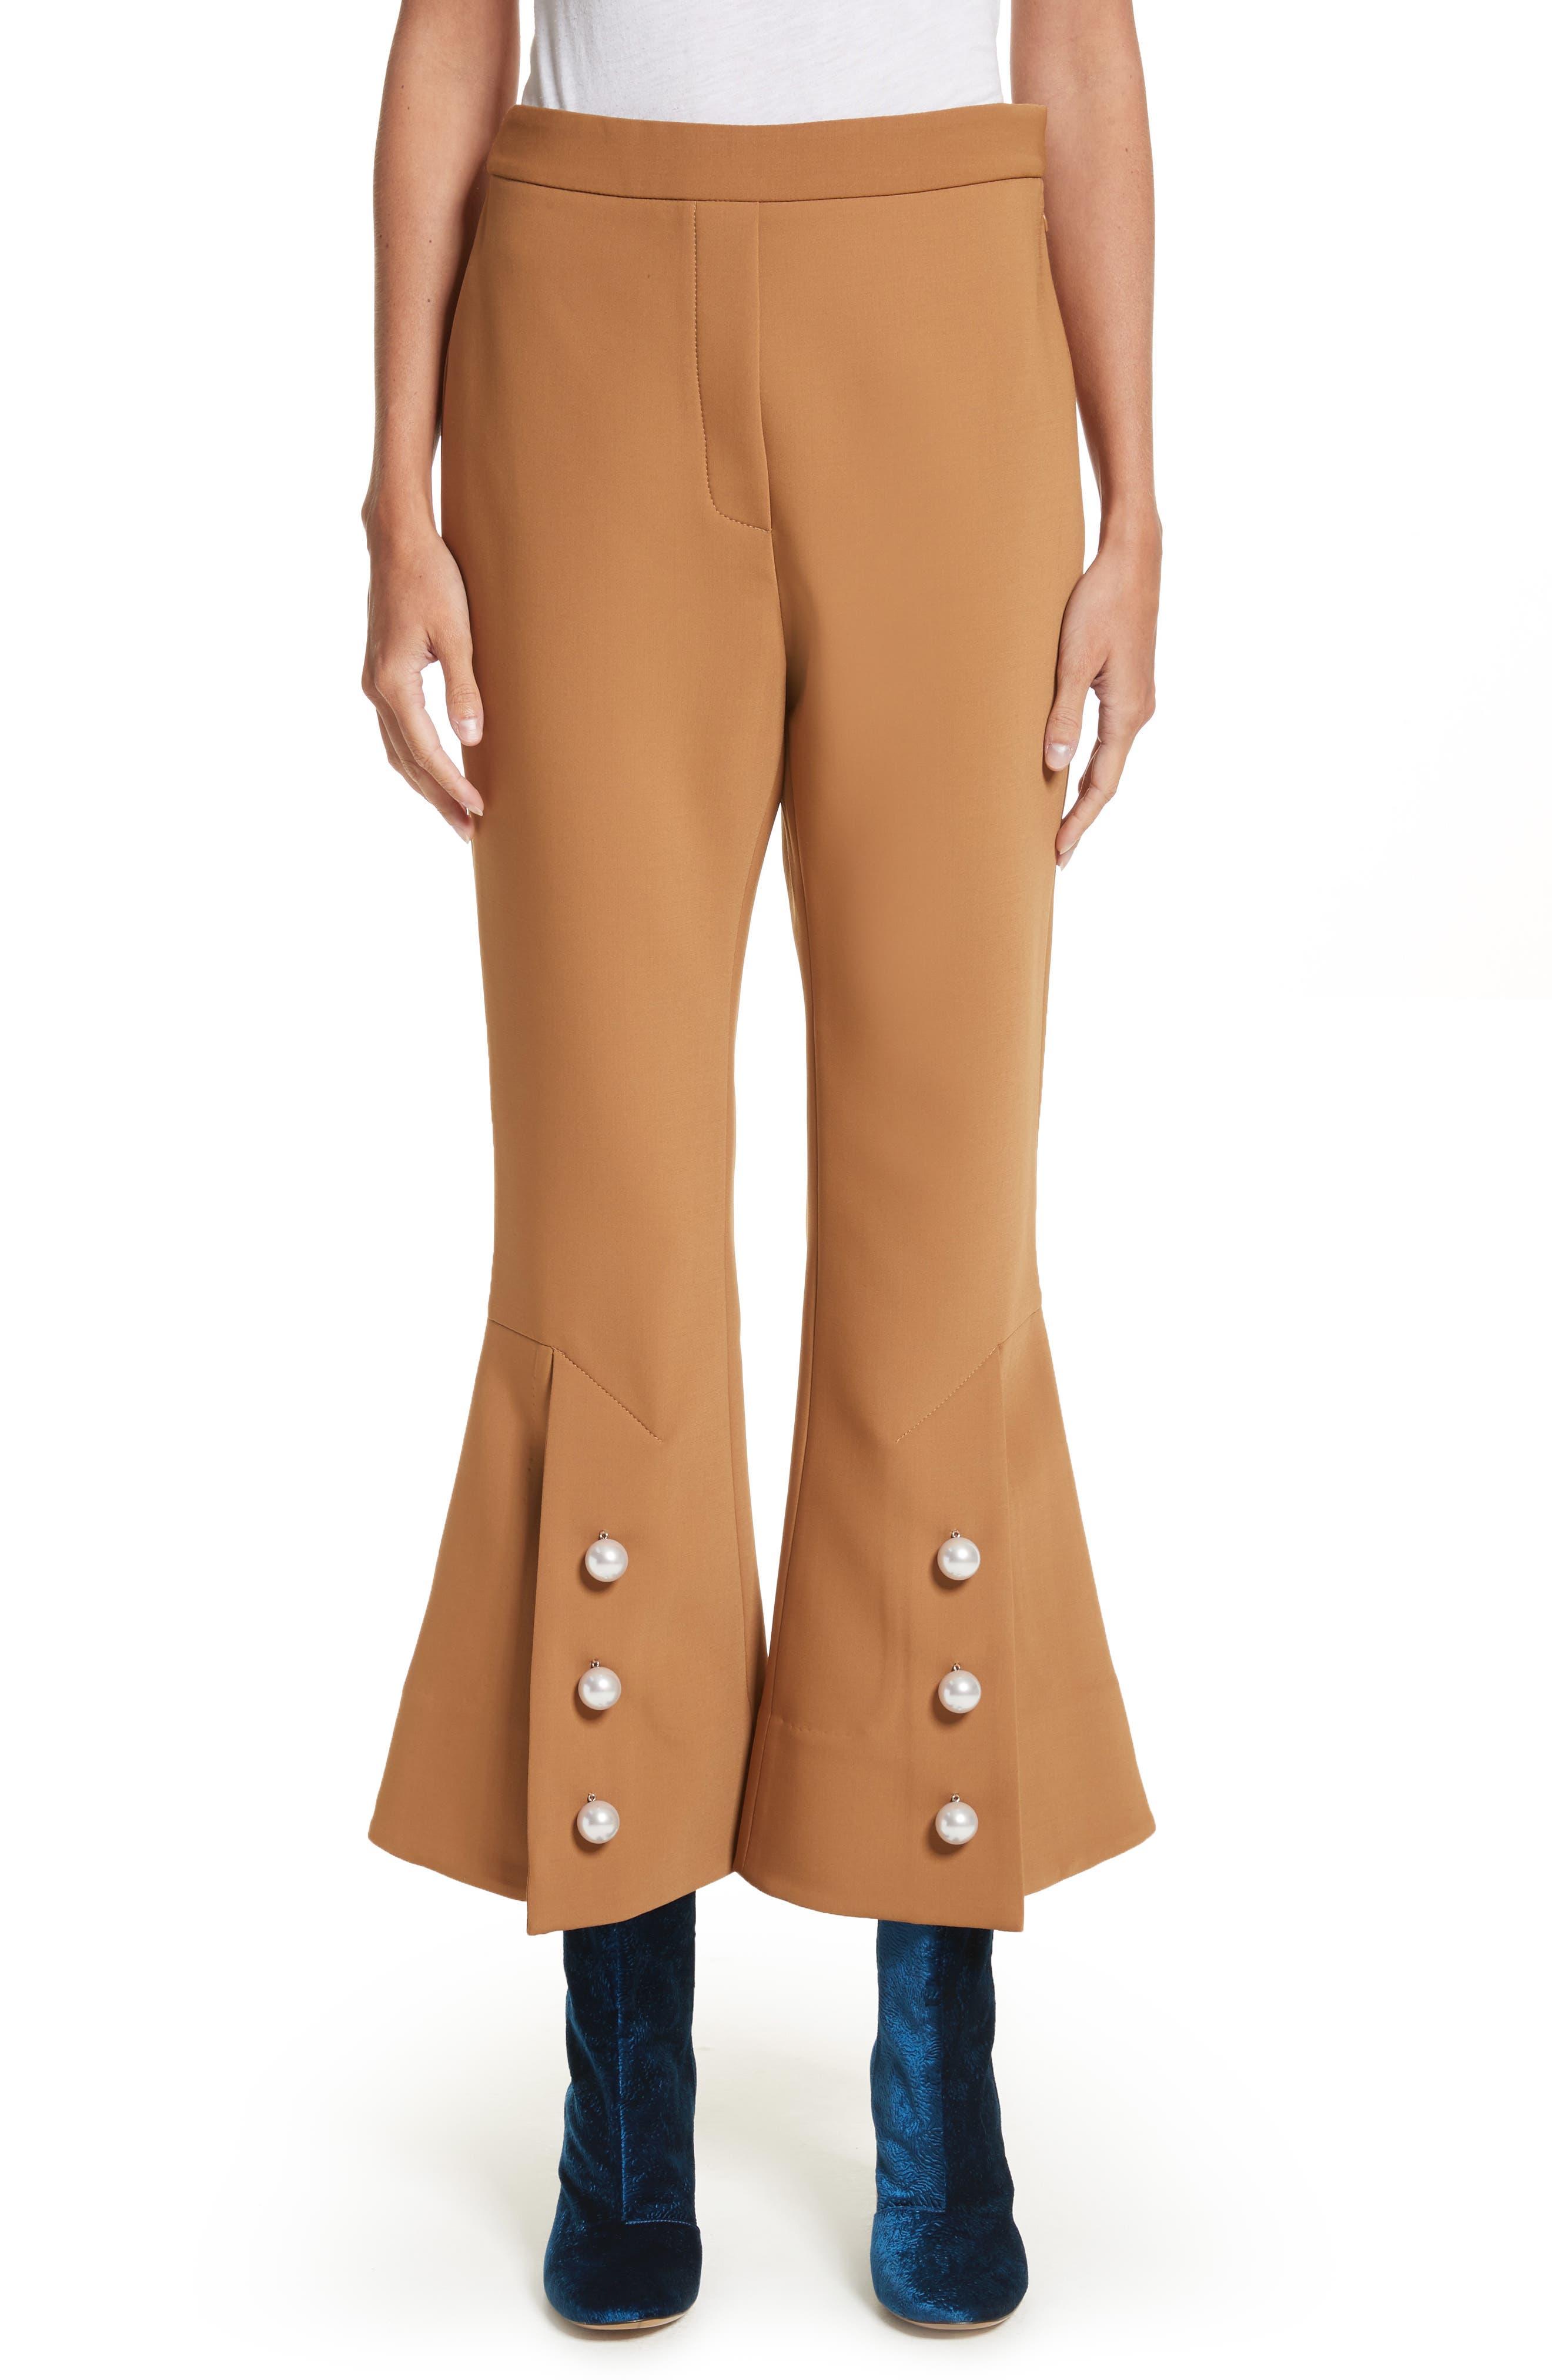 Fourth Element Crop Flare Pants,                         Main,                         color, Camel